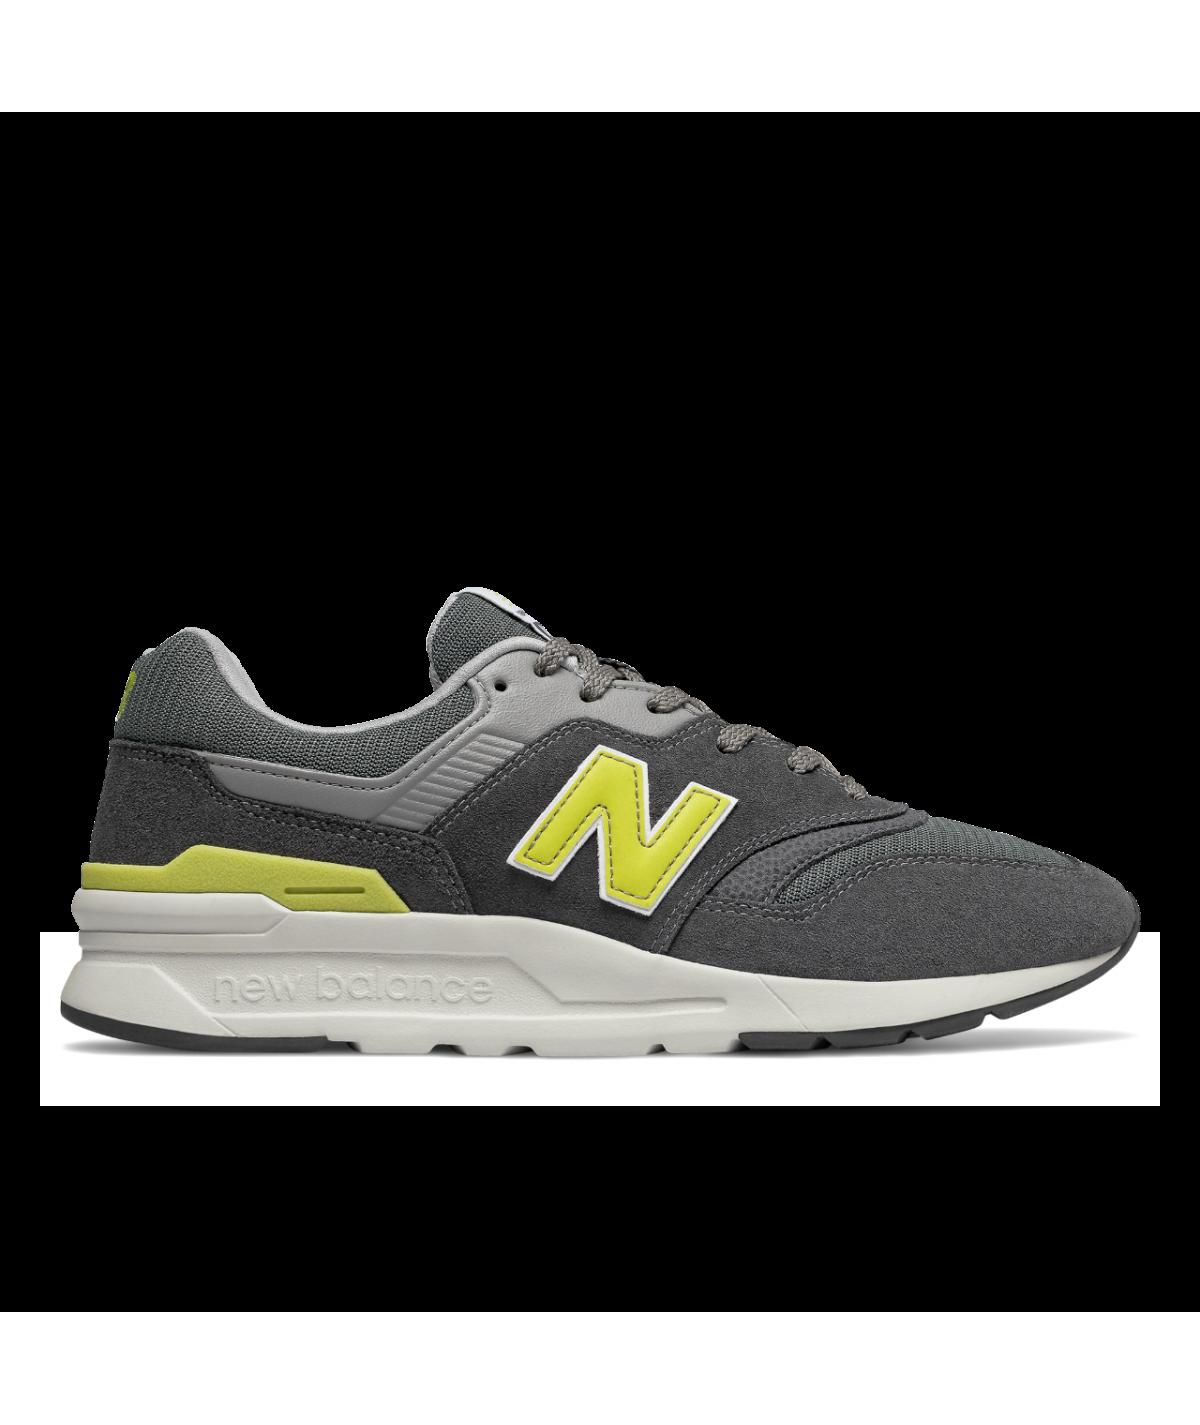 New Balance 997 HDJ Sneaker uomo grigio